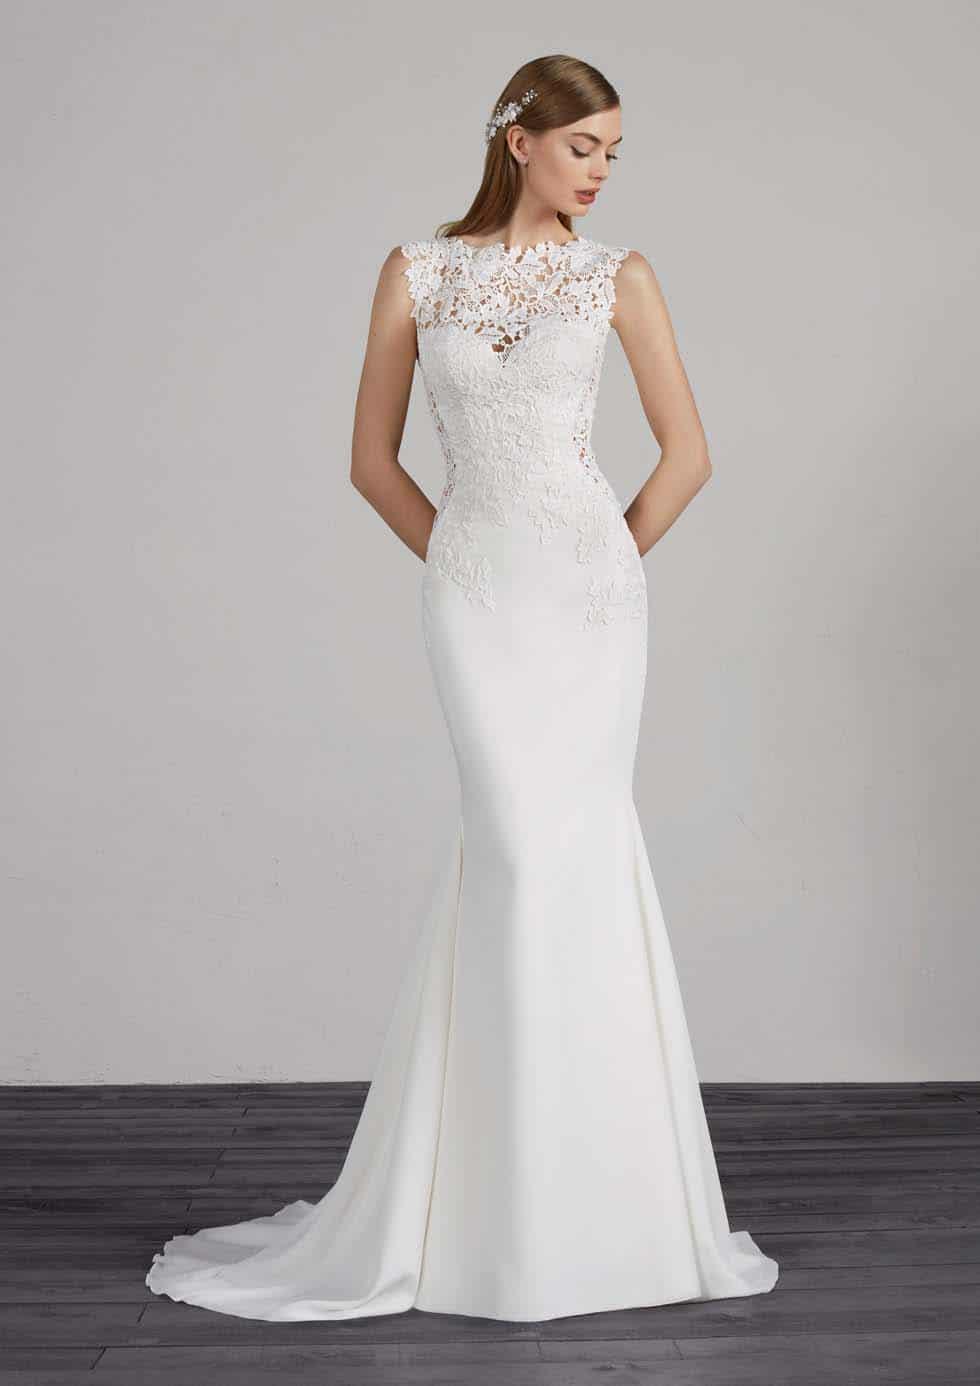 Hochzeitskleid Milano Pronovias